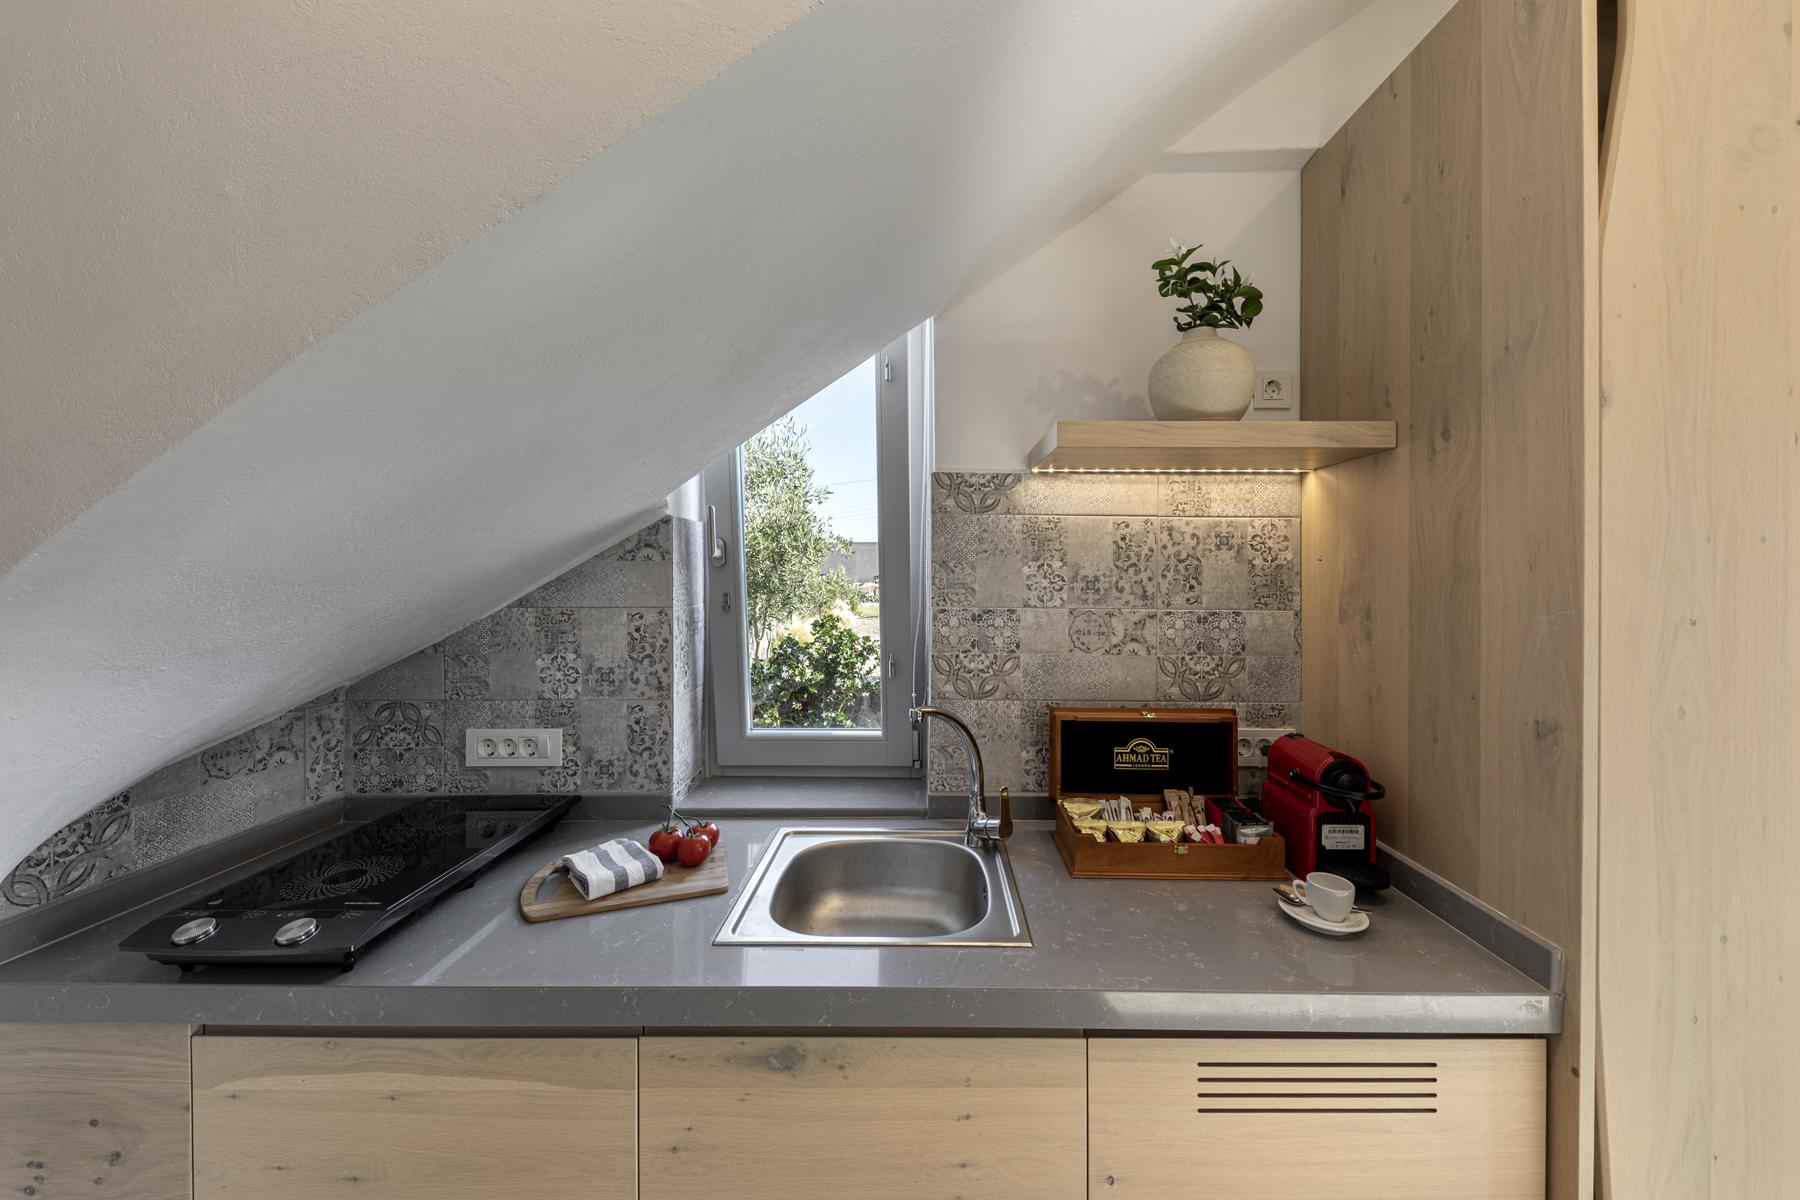 Alafropetra Luxury Suites - Suite 4 - kitchenette